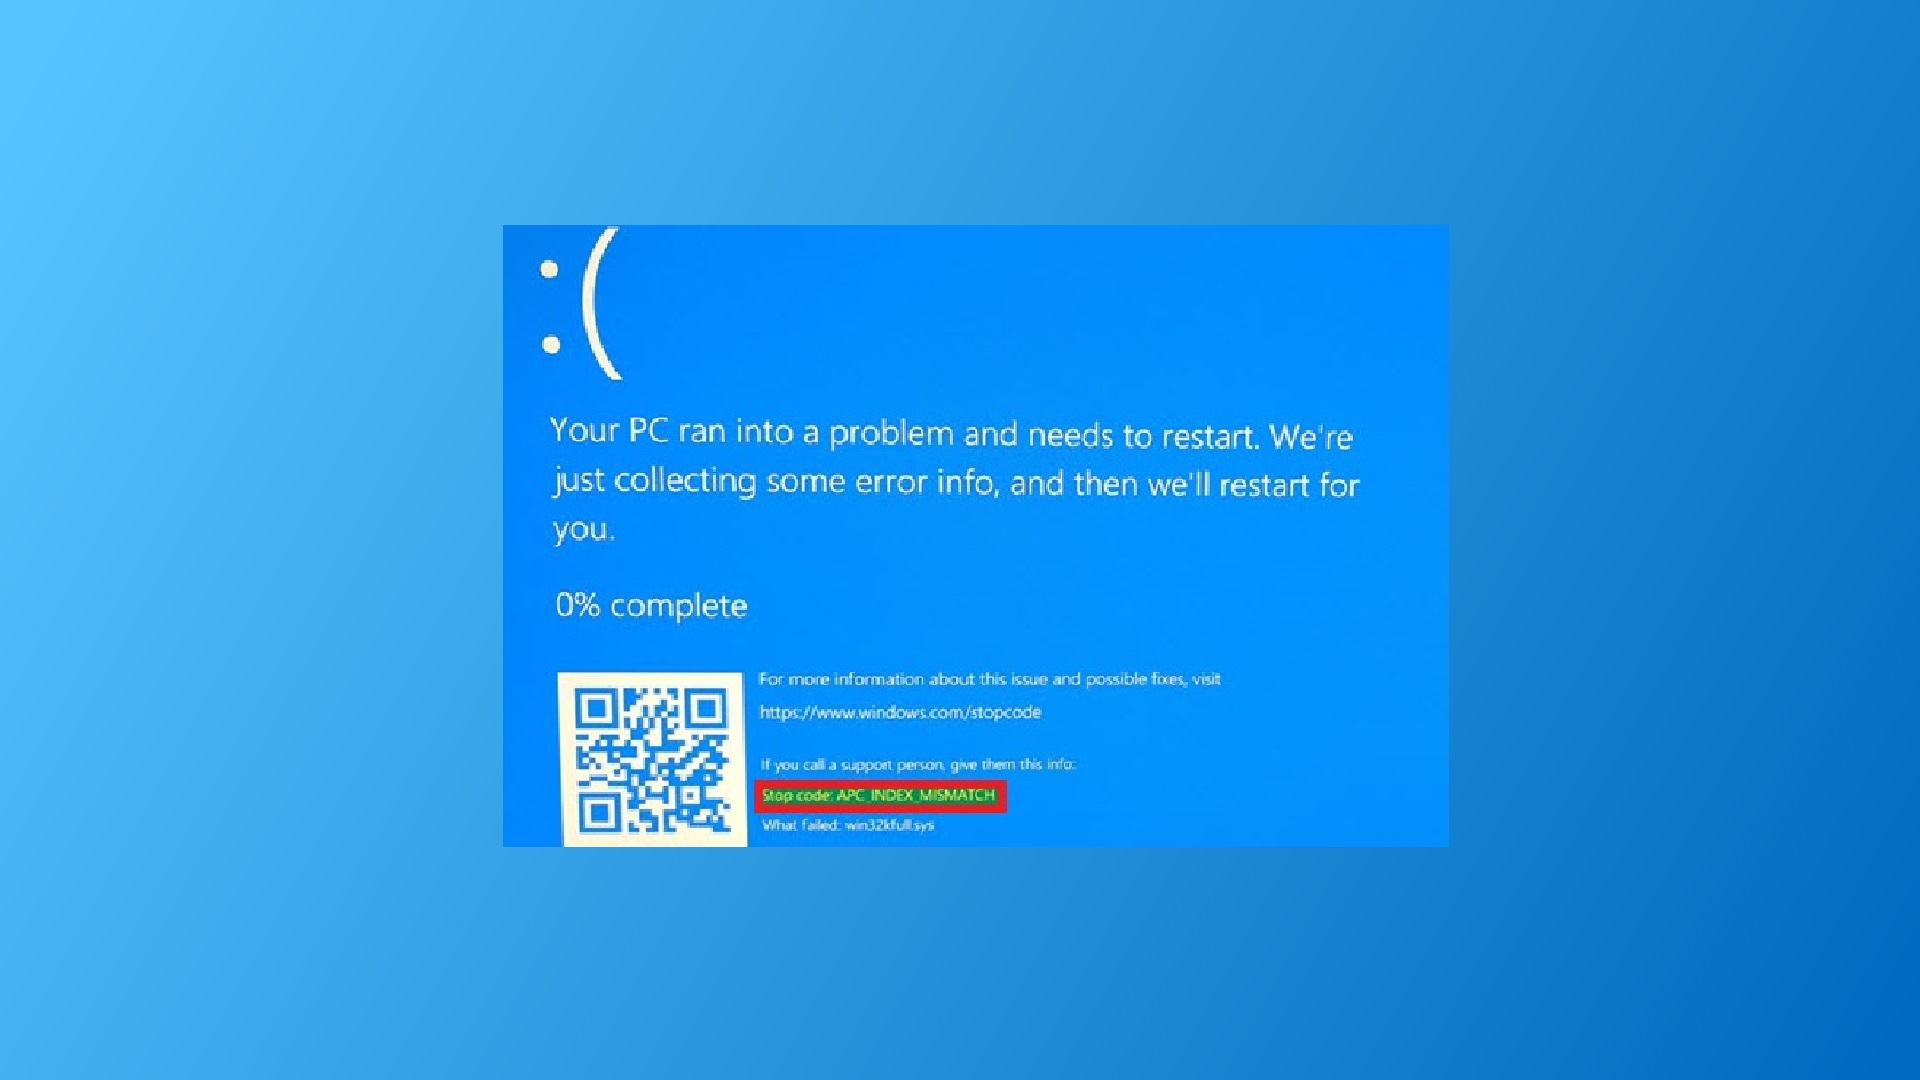 How to fix APC_INDEX_MISMATCH Stop Error on Windows 10